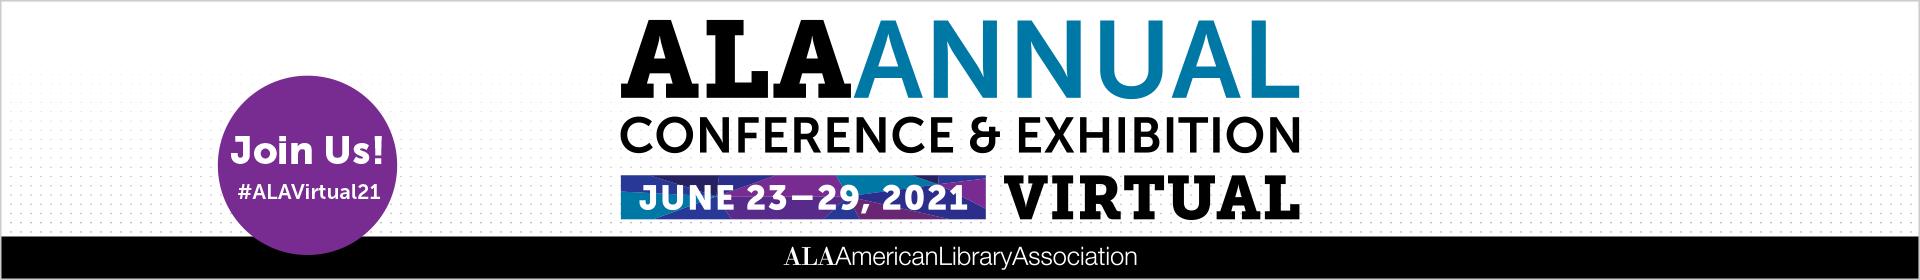 2021 ALA Annual Virtual Event Banner